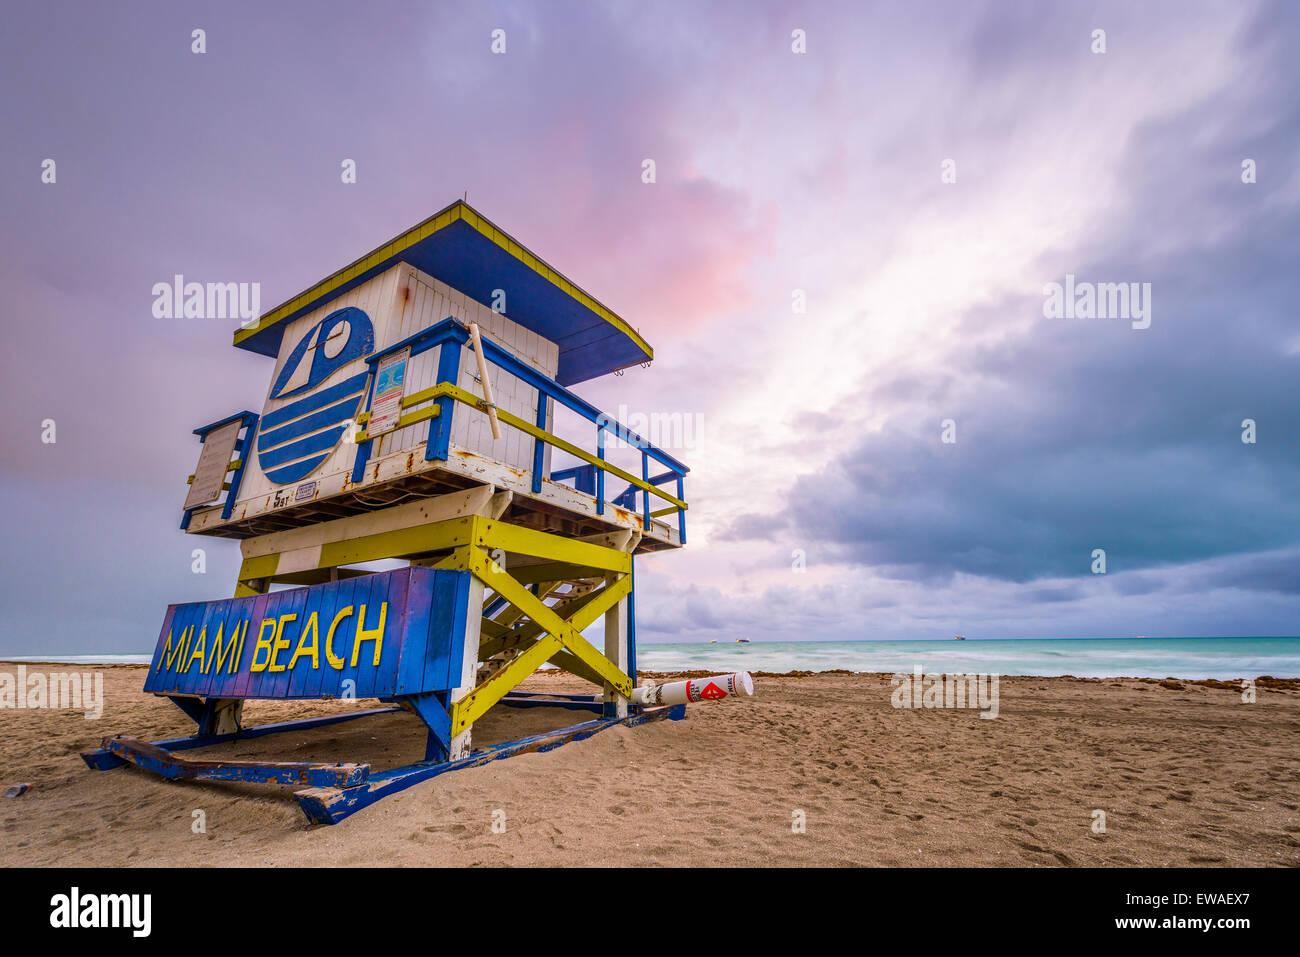 Miami Beach, Florida, USA life guard tower. - Stock Image